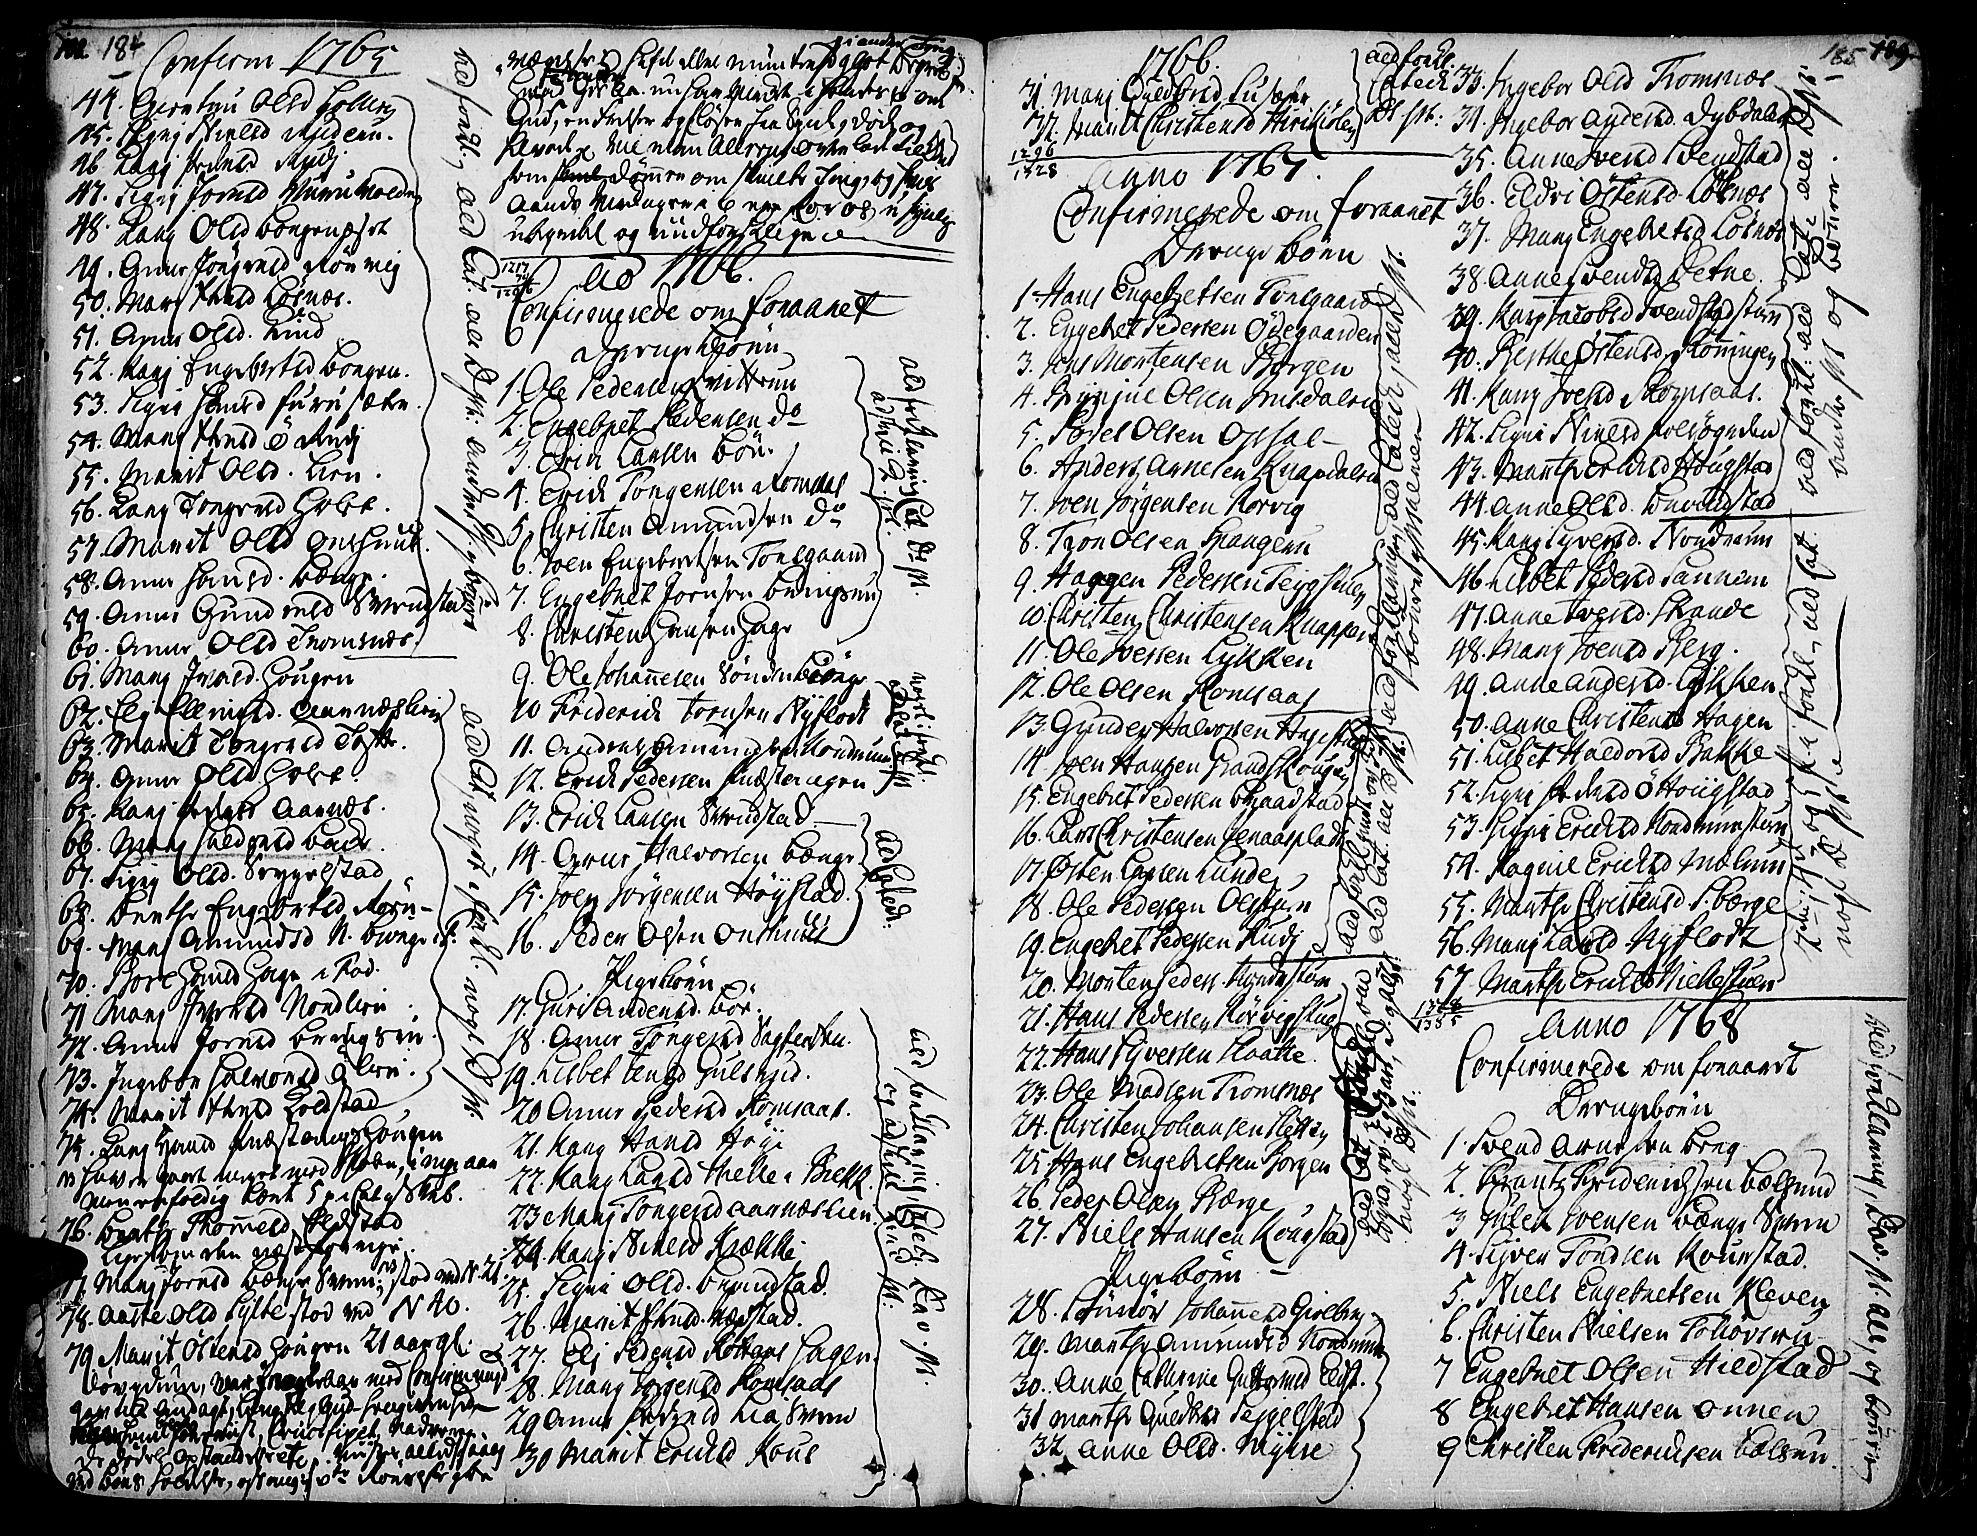 SAH, Ringebu prestekontor, Ministerialbok nr. 2, 1734-1780, s. 184-185